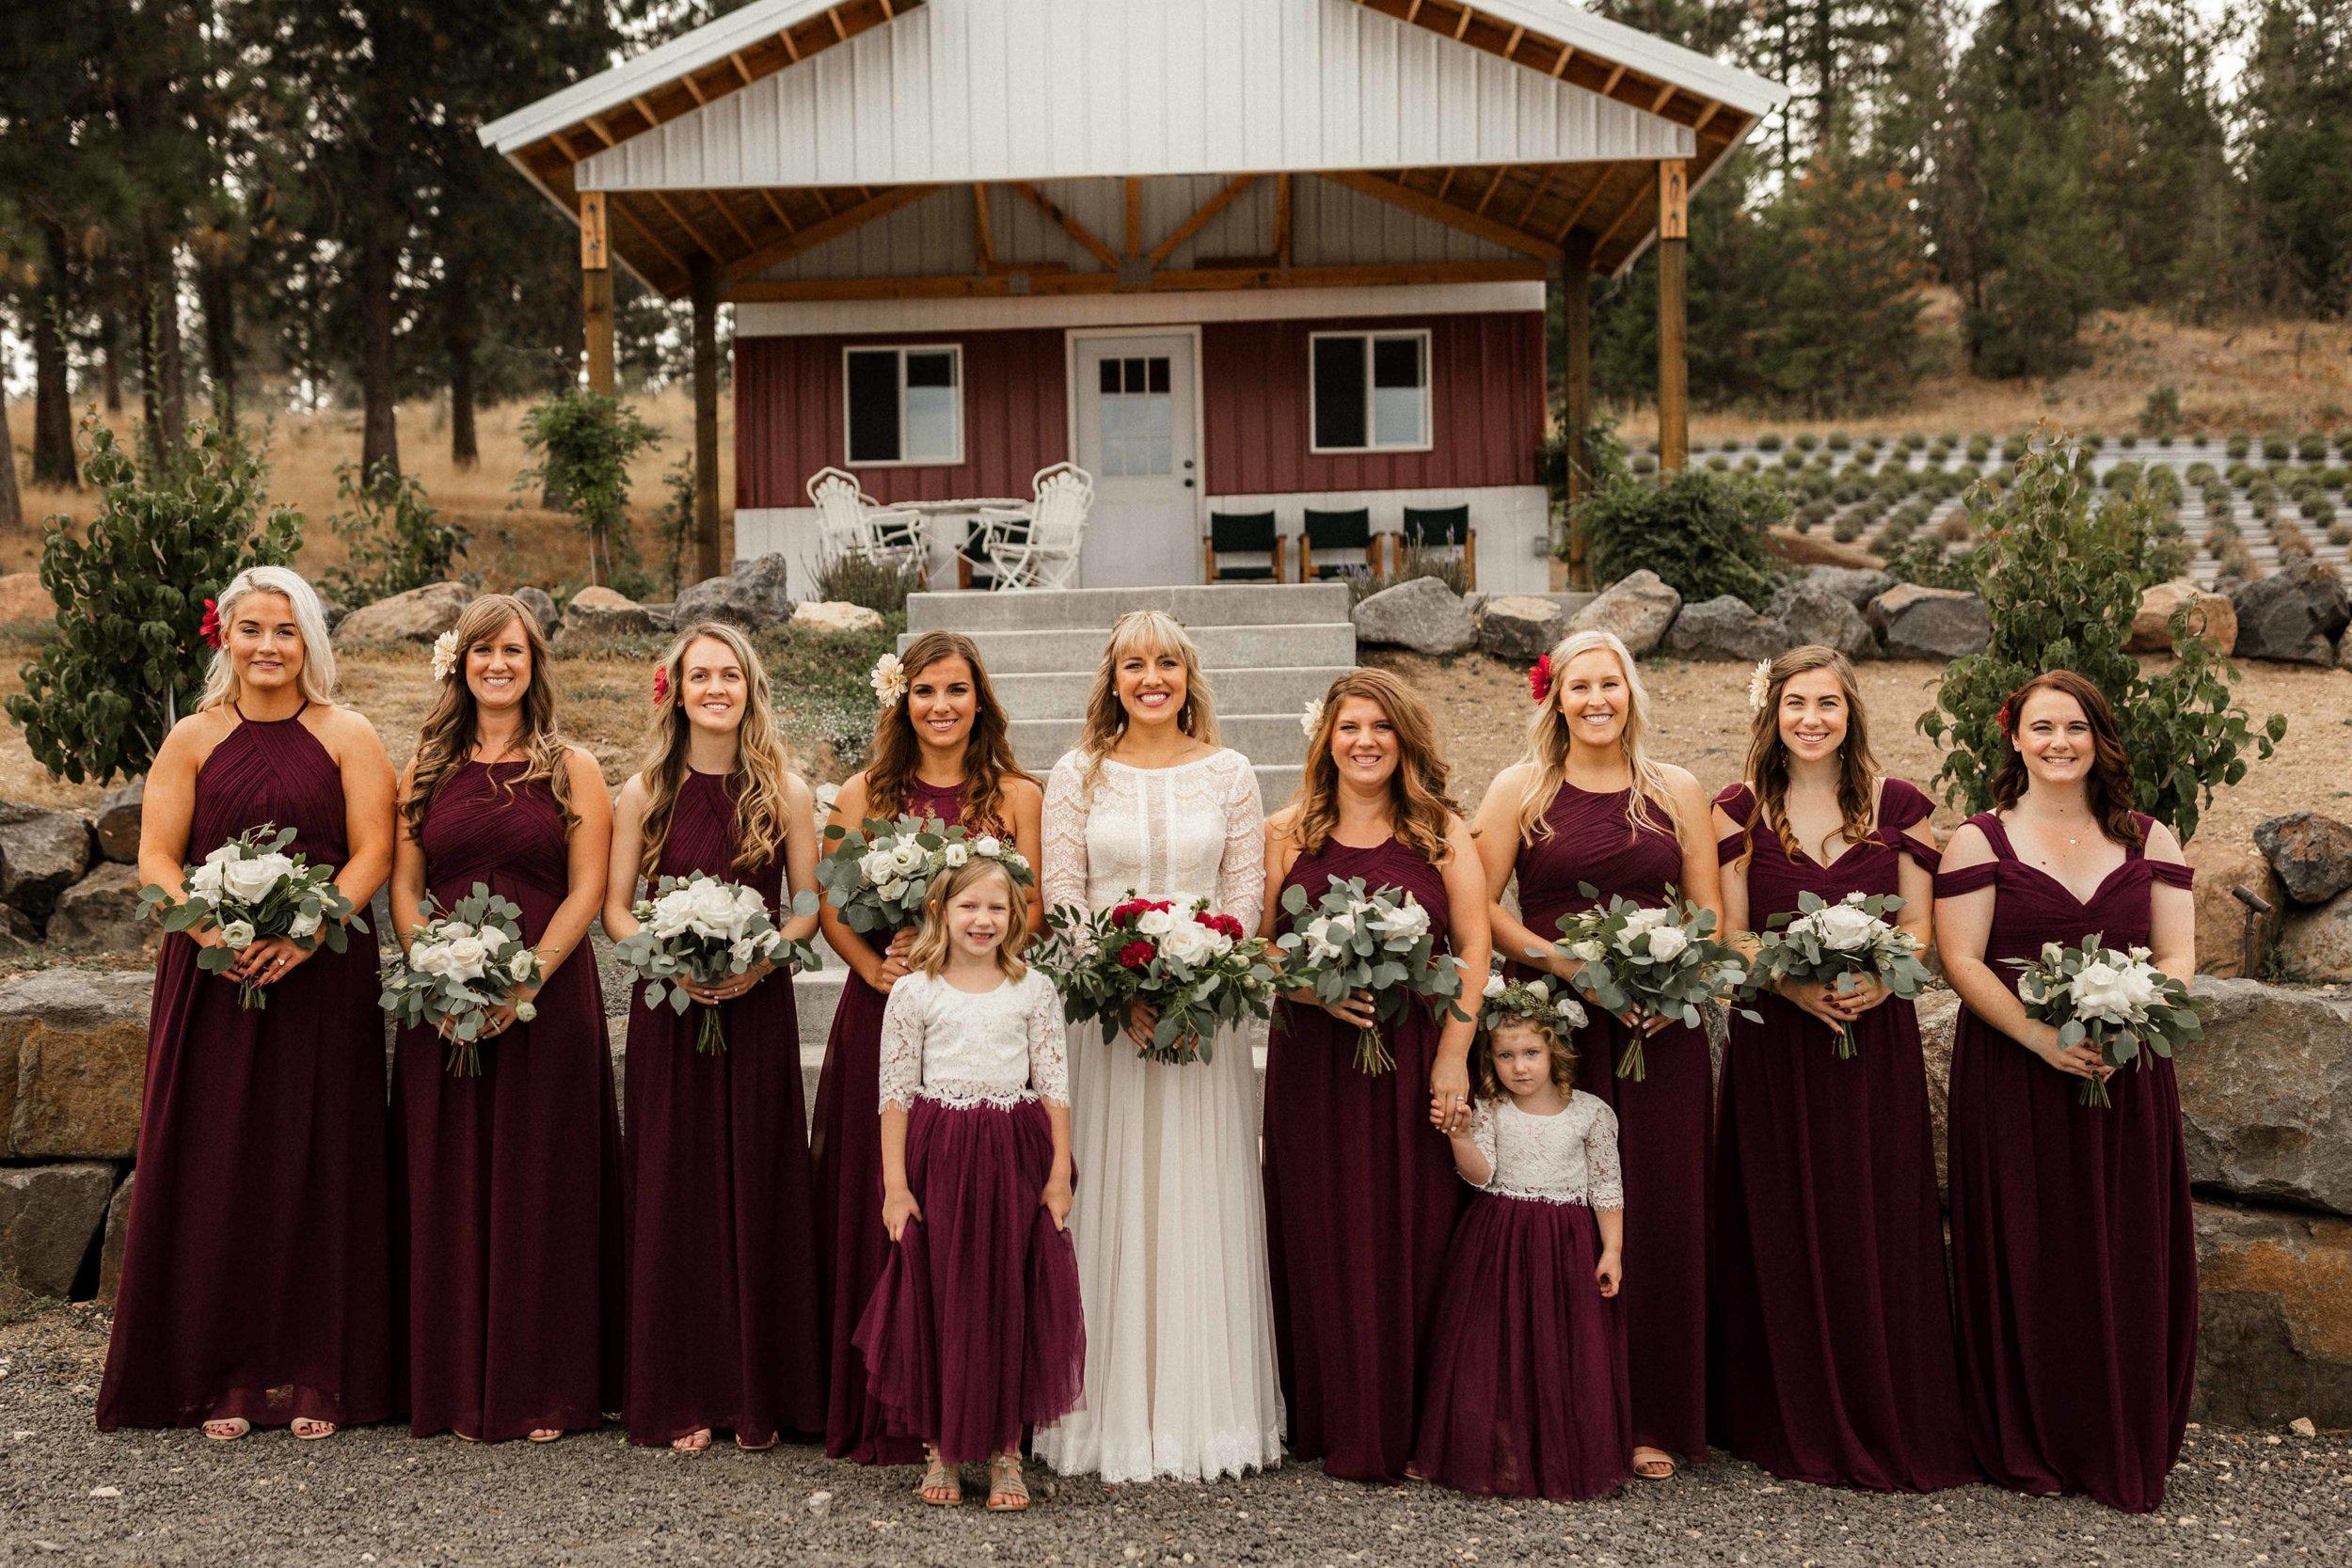 lavender-manor-wedding-31.jpg